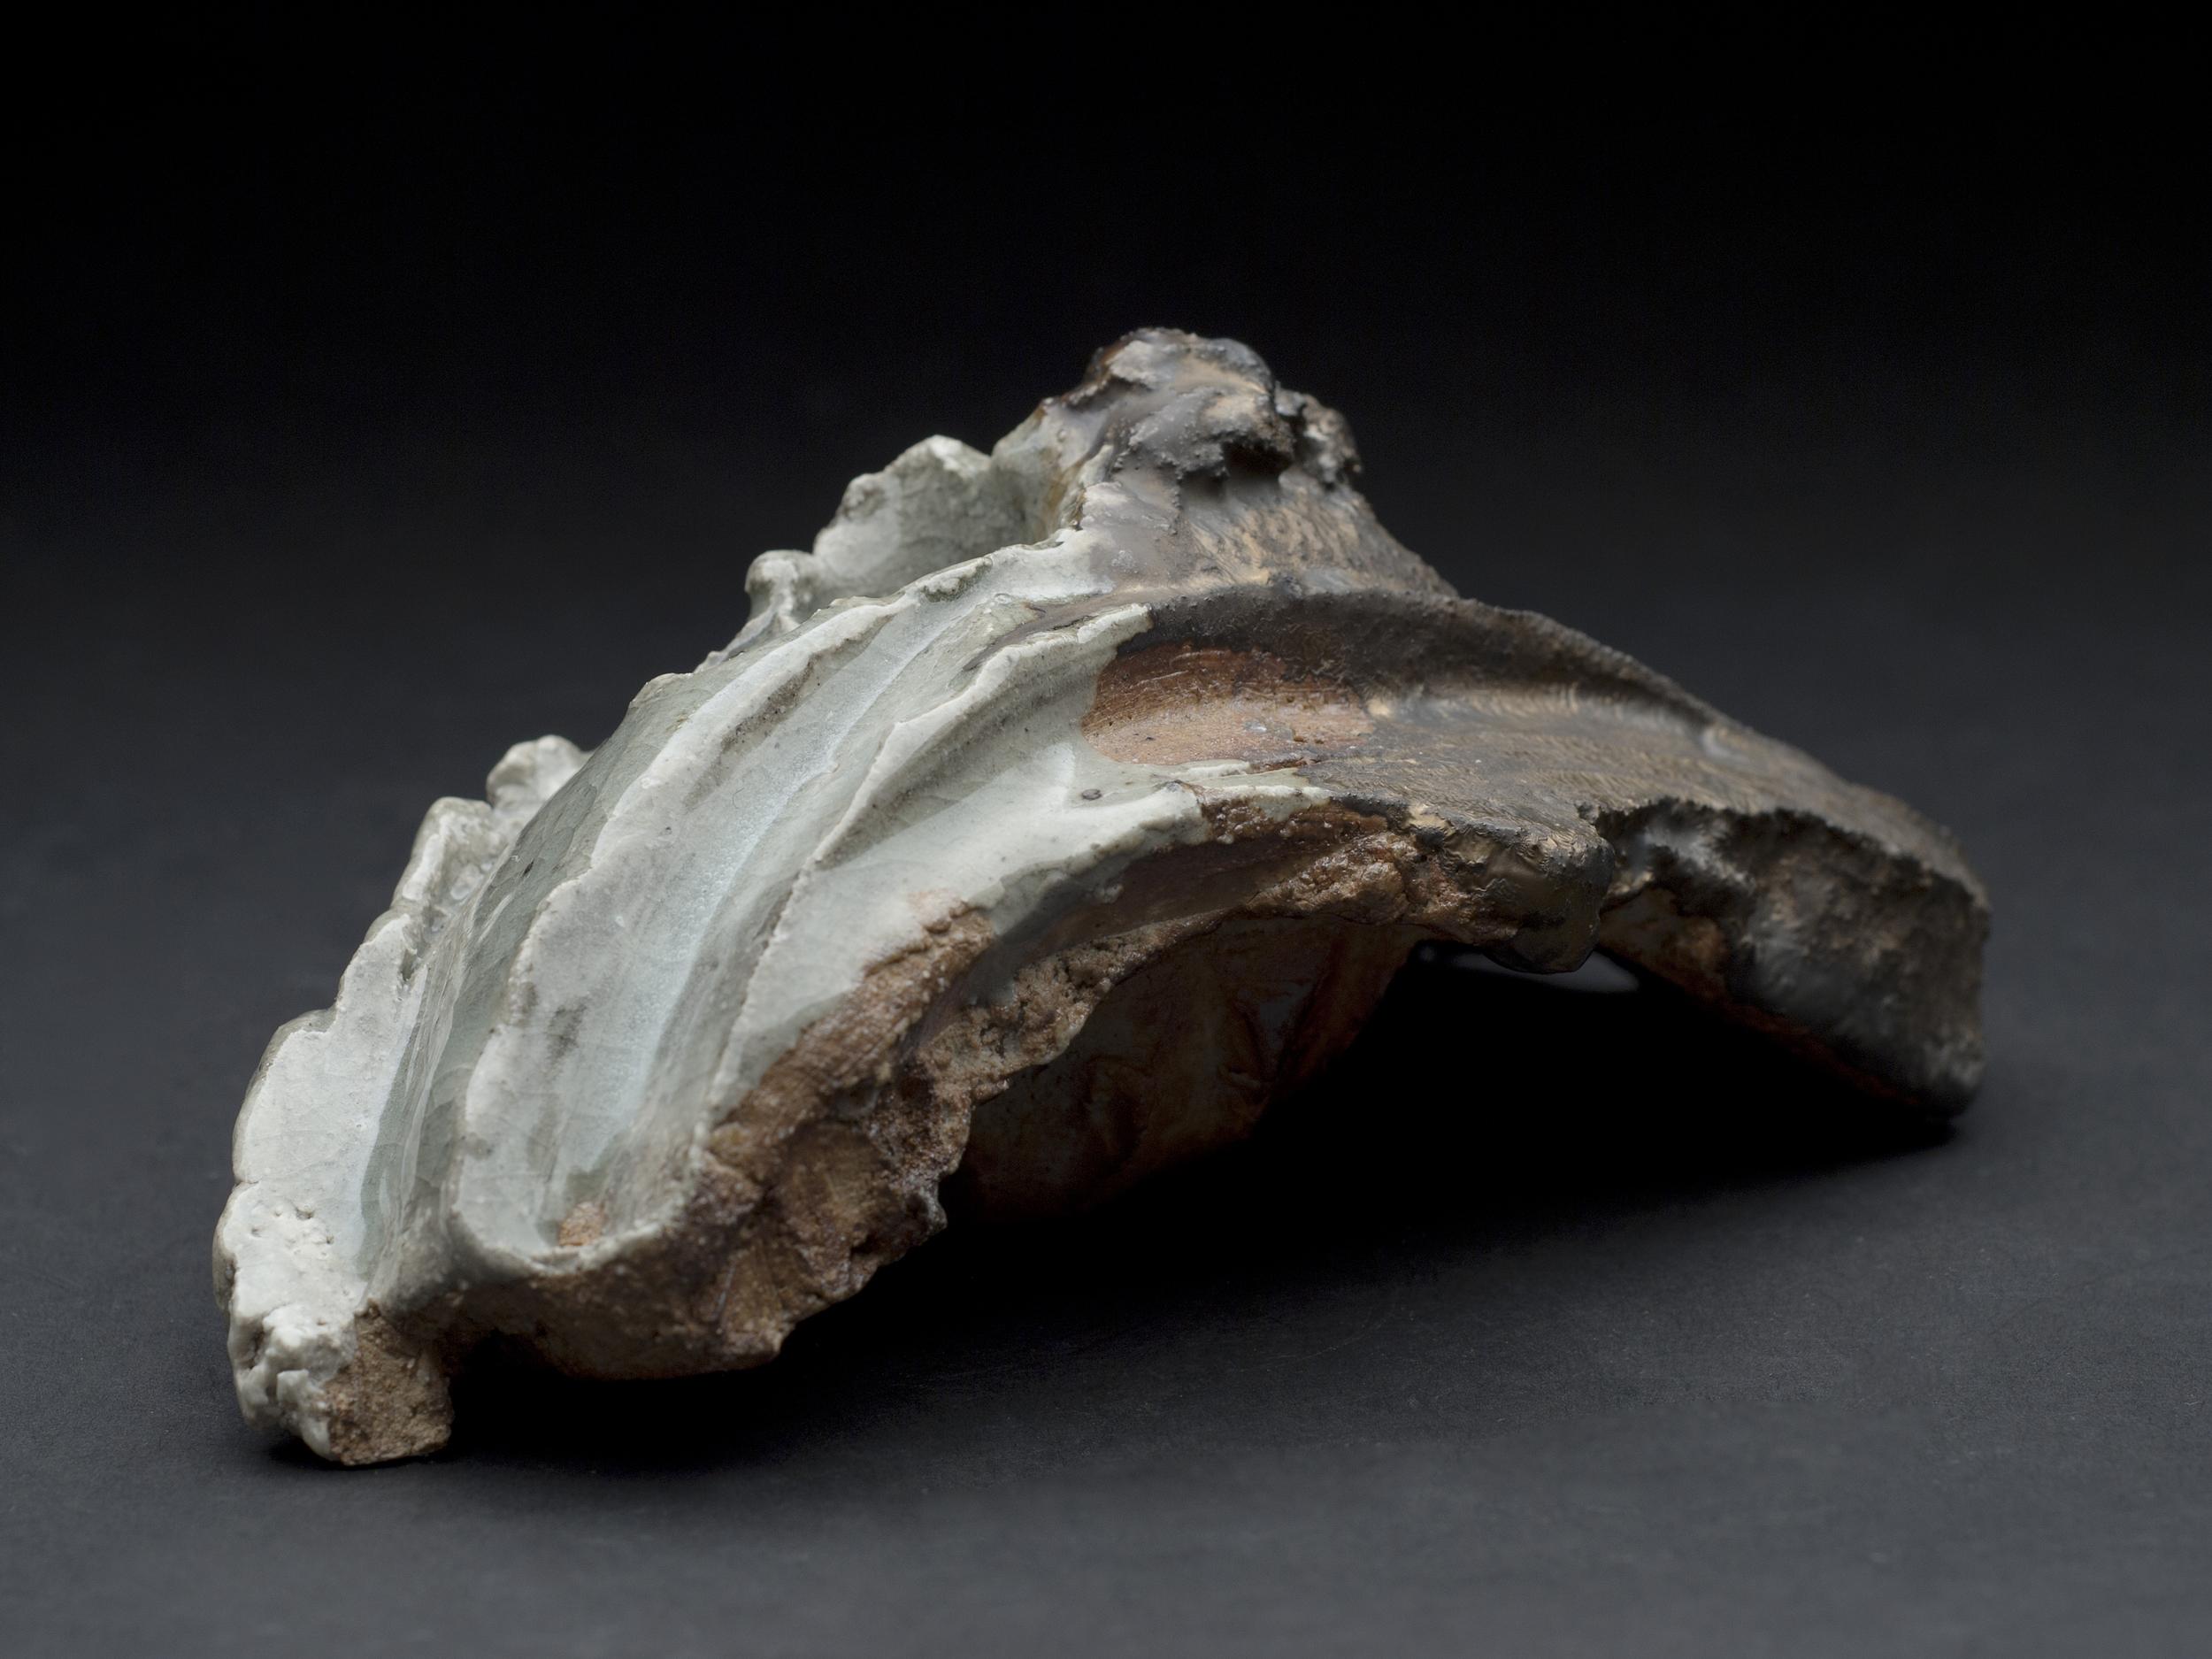 Jeff Shapiro    Small Organic Form  , 2012 Ceramic 2.5 x 6 x 3.5 inches  6.4 x 15.2 x 8.9 cm  JSh 44